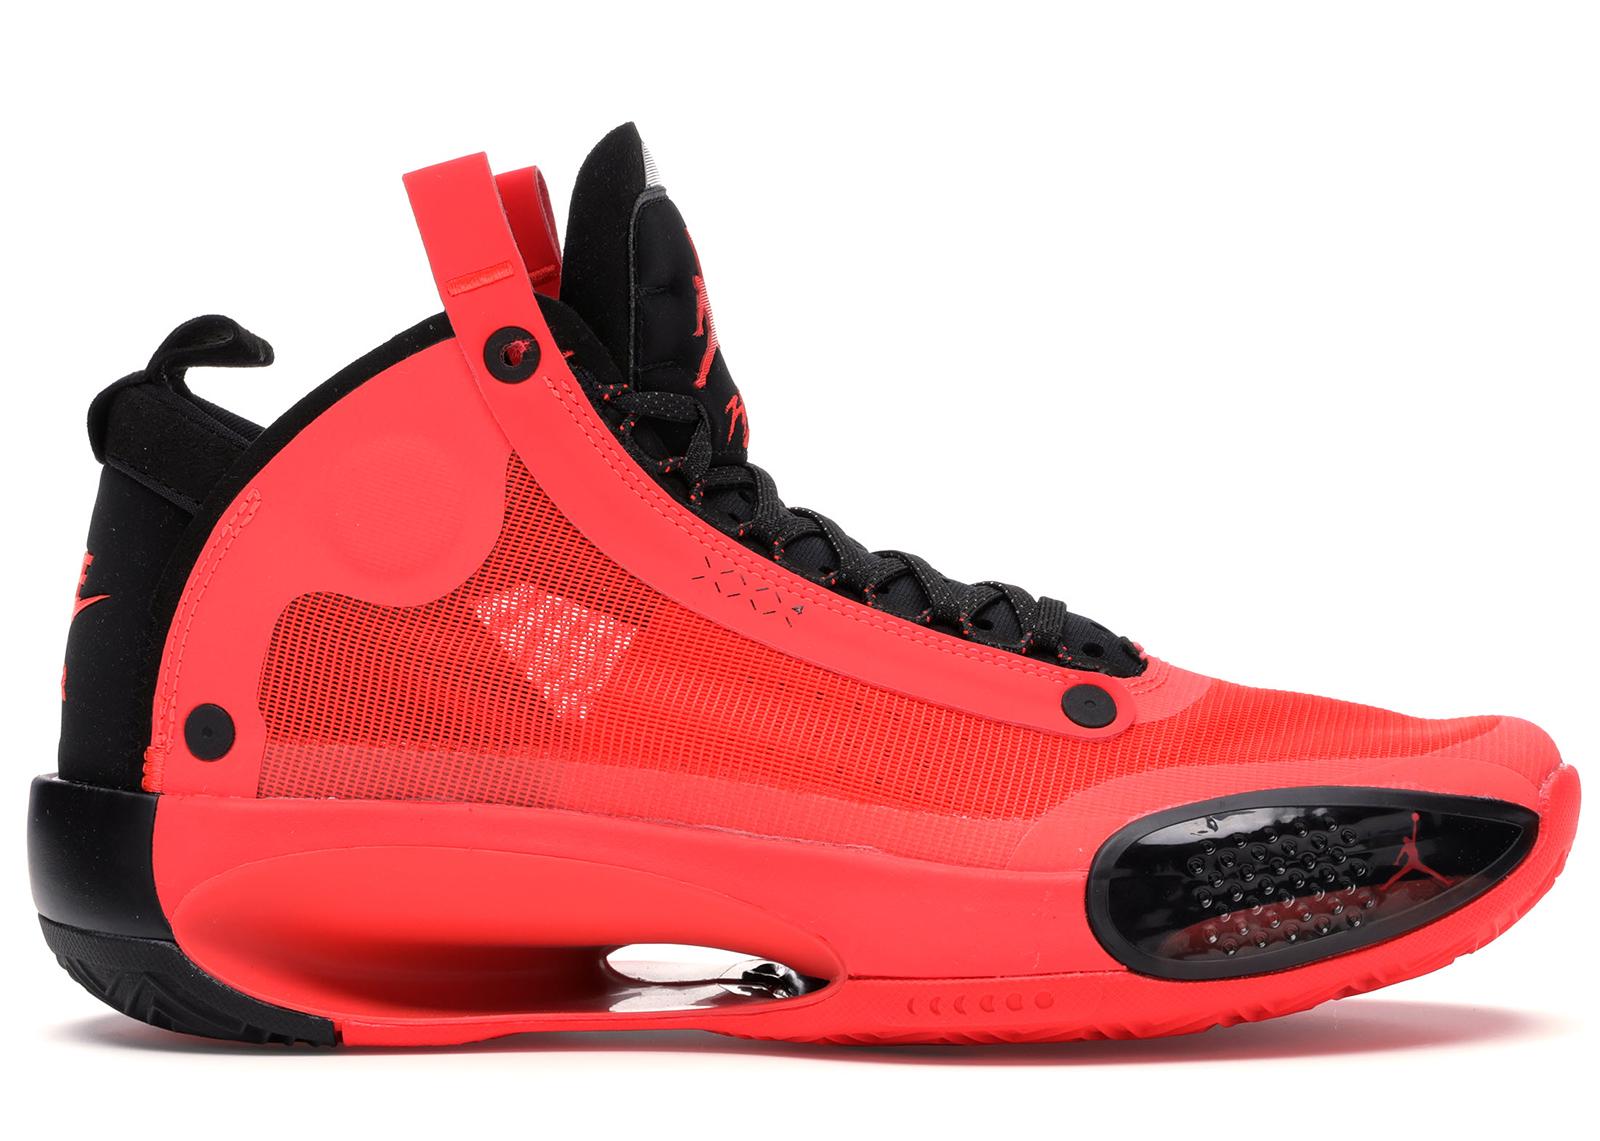 Jordan XXXIV Infrared 23 - AR3240-600